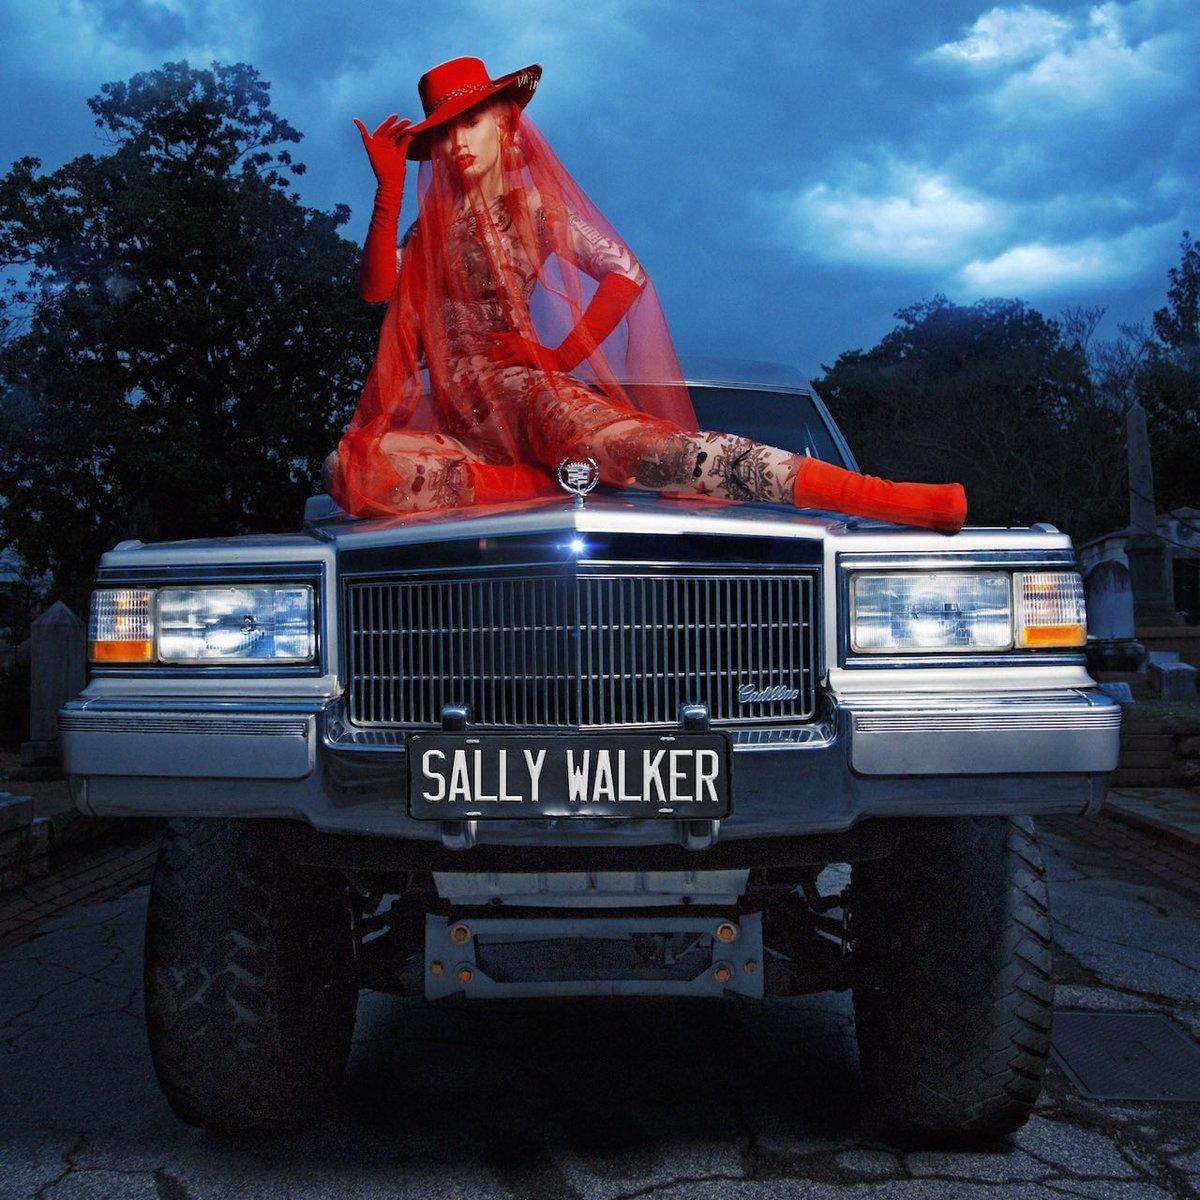 Rap-Up's photo on Iggy Azalea - Sally Walker